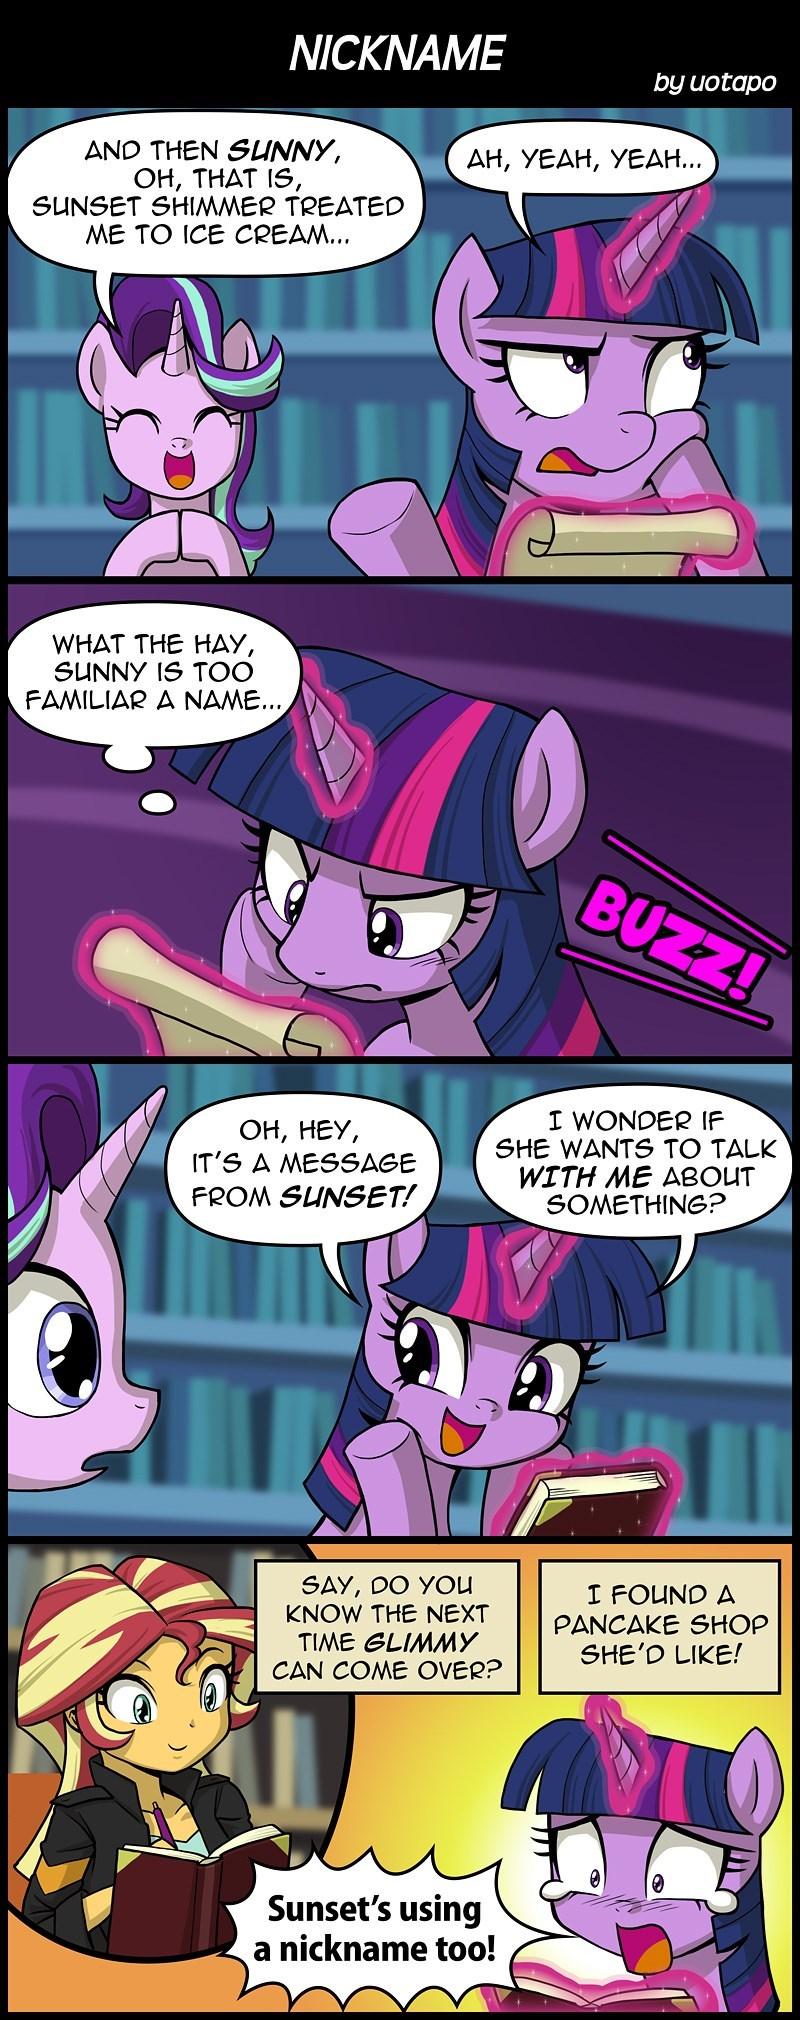 equestria girls starlight glimmer twilight sparkle mirror magic uotapo comic sunset shimmer - 9059562496